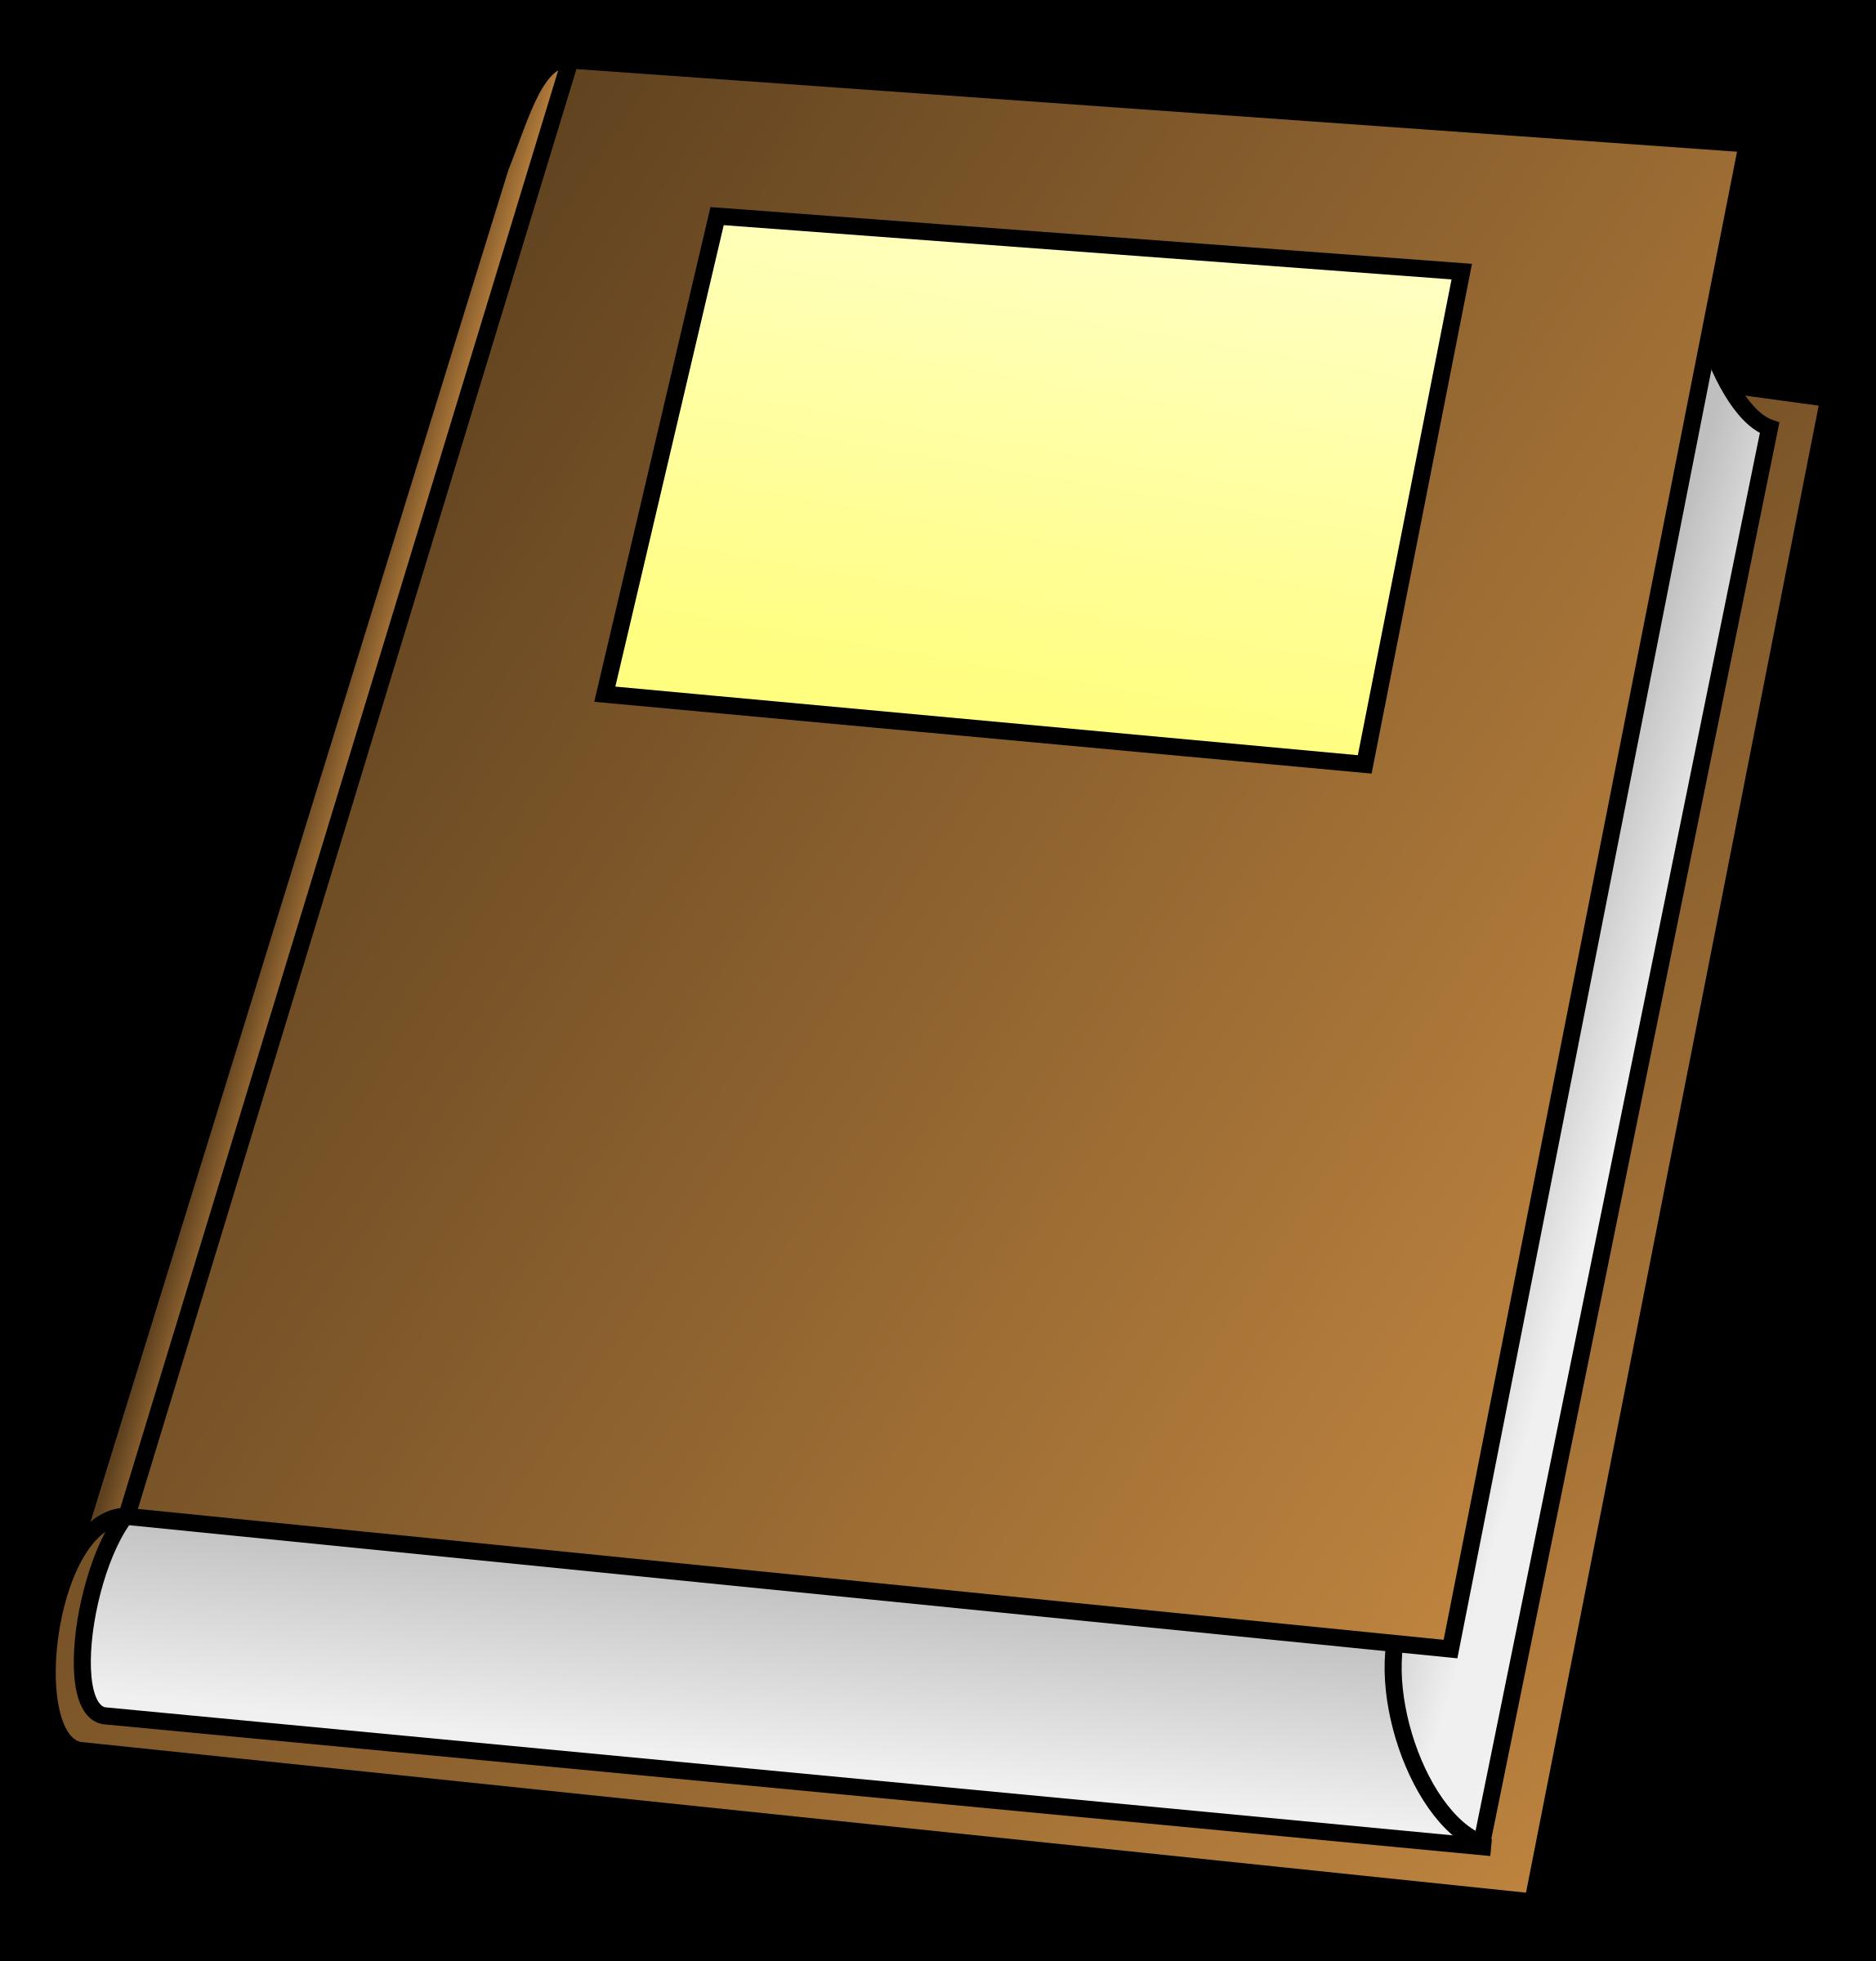 png Book big image png. Books clipart rectangular